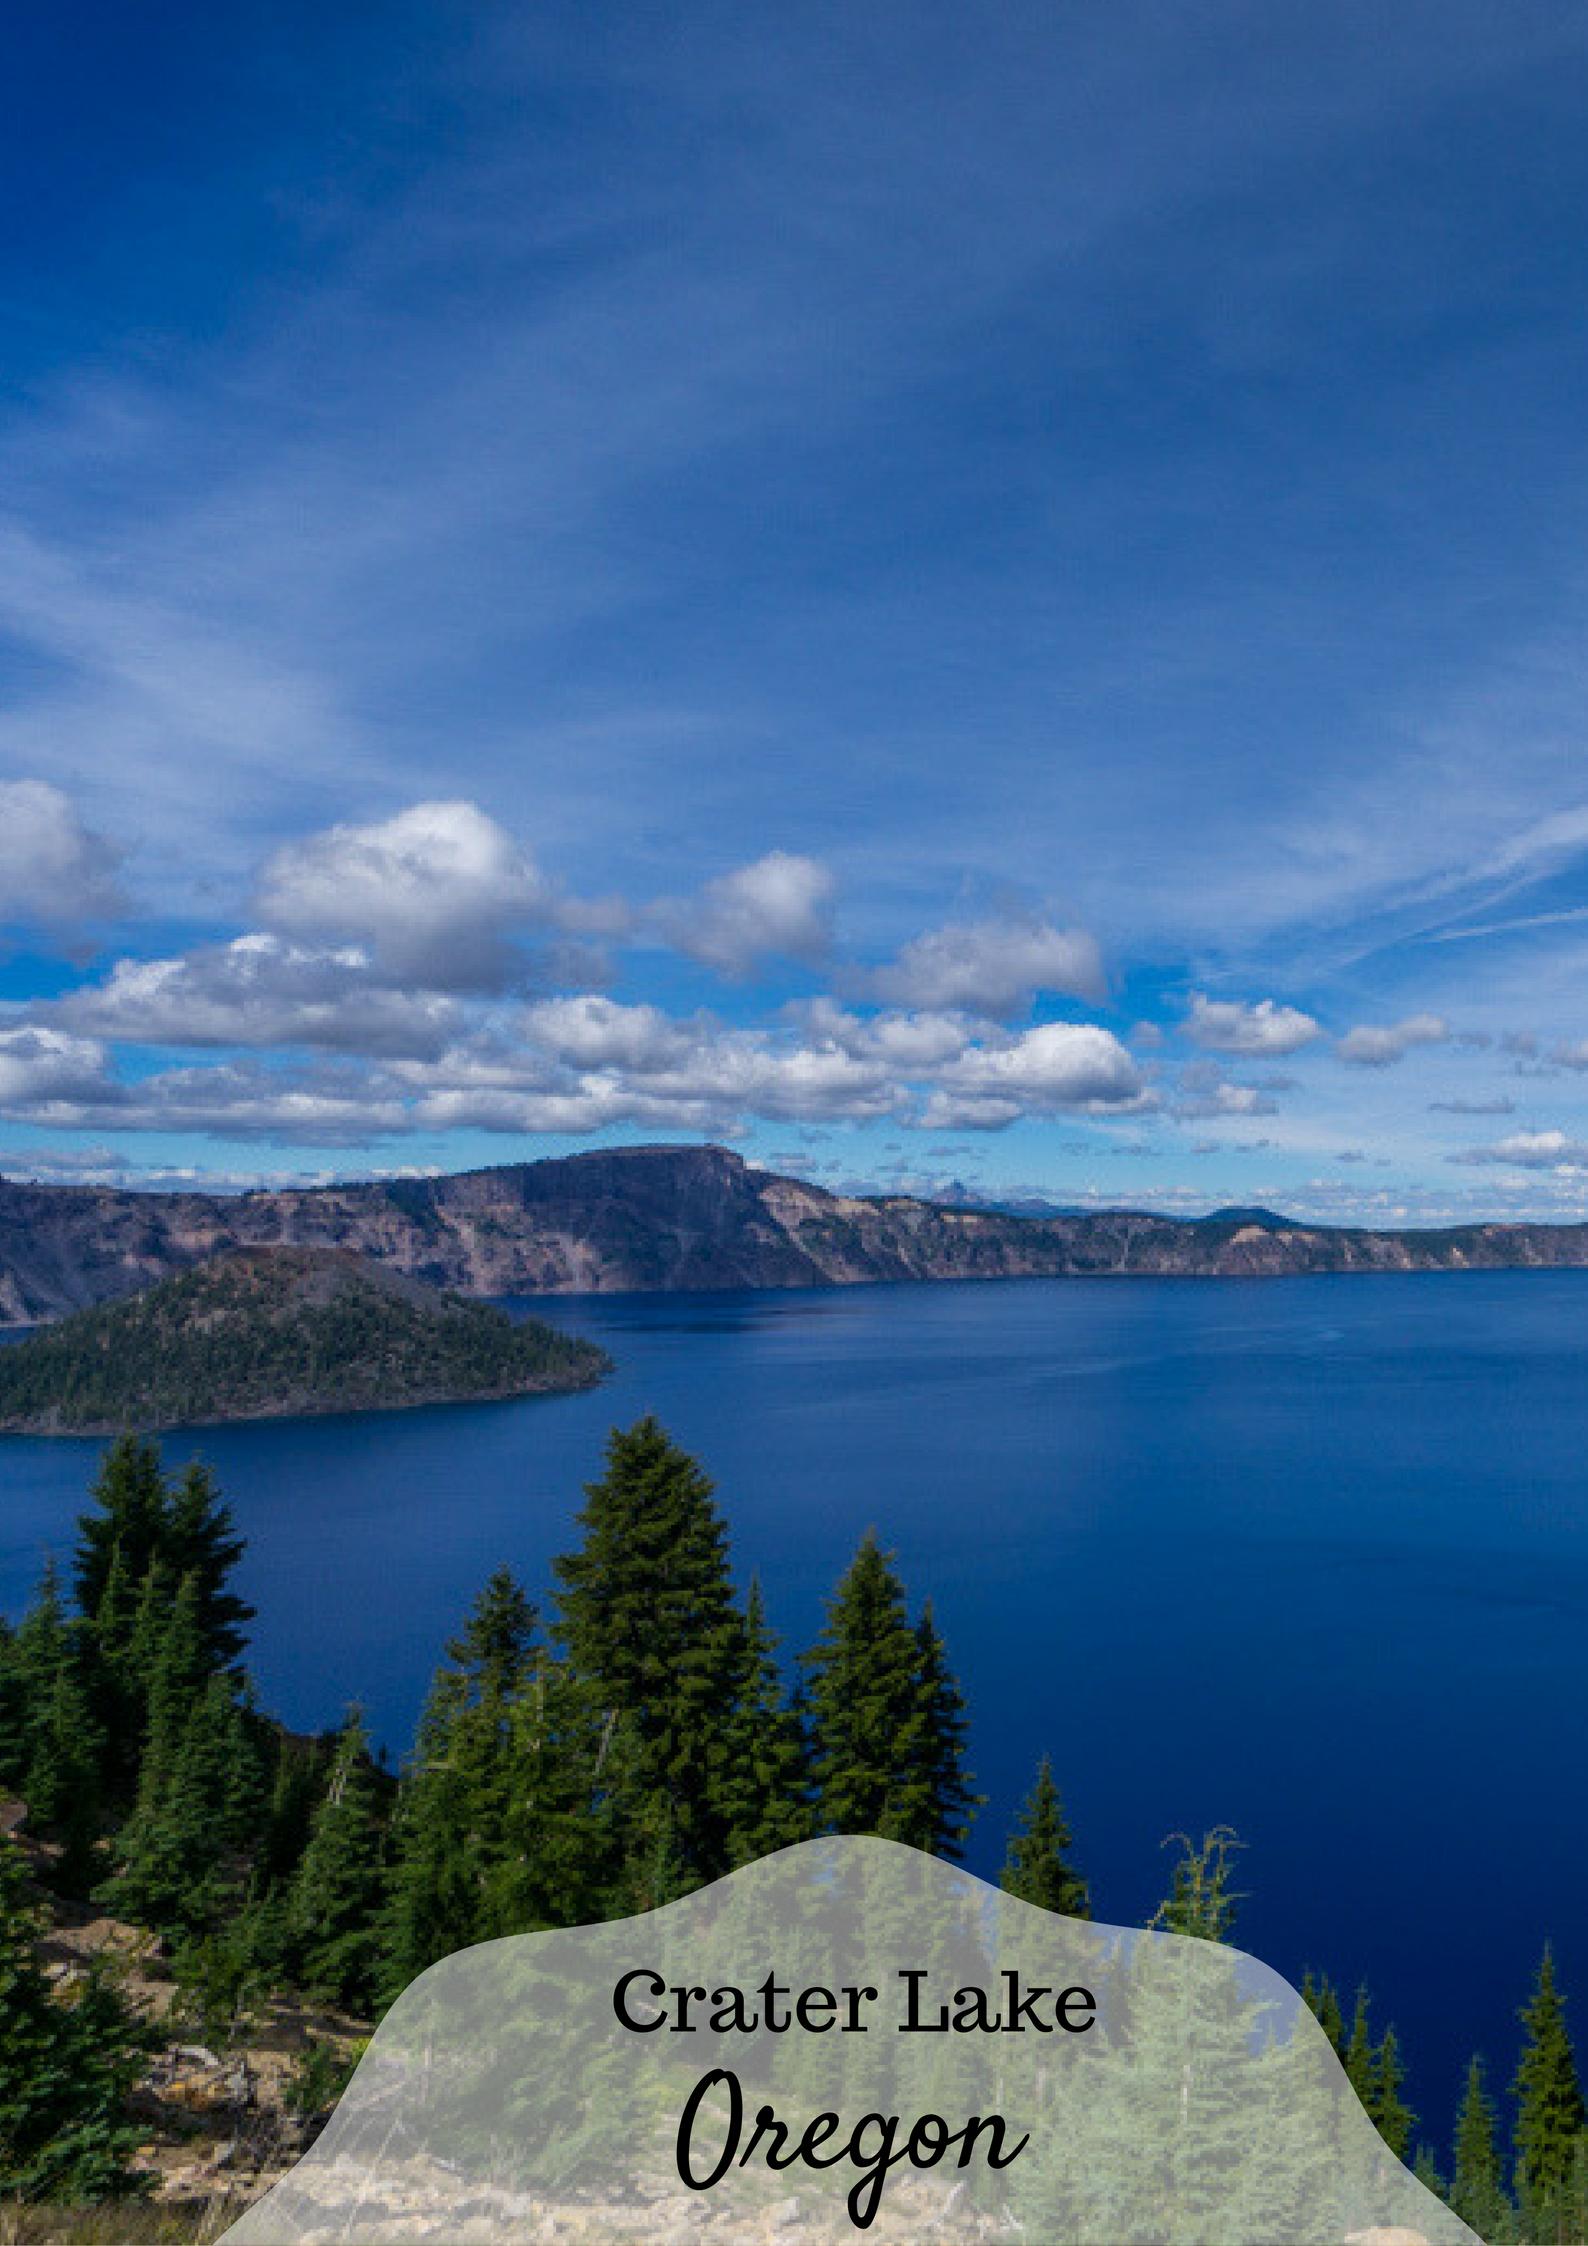 Oregon - Crater Lake #craterlakeoregon Crater Lake, Oregon #craterlakeoregon